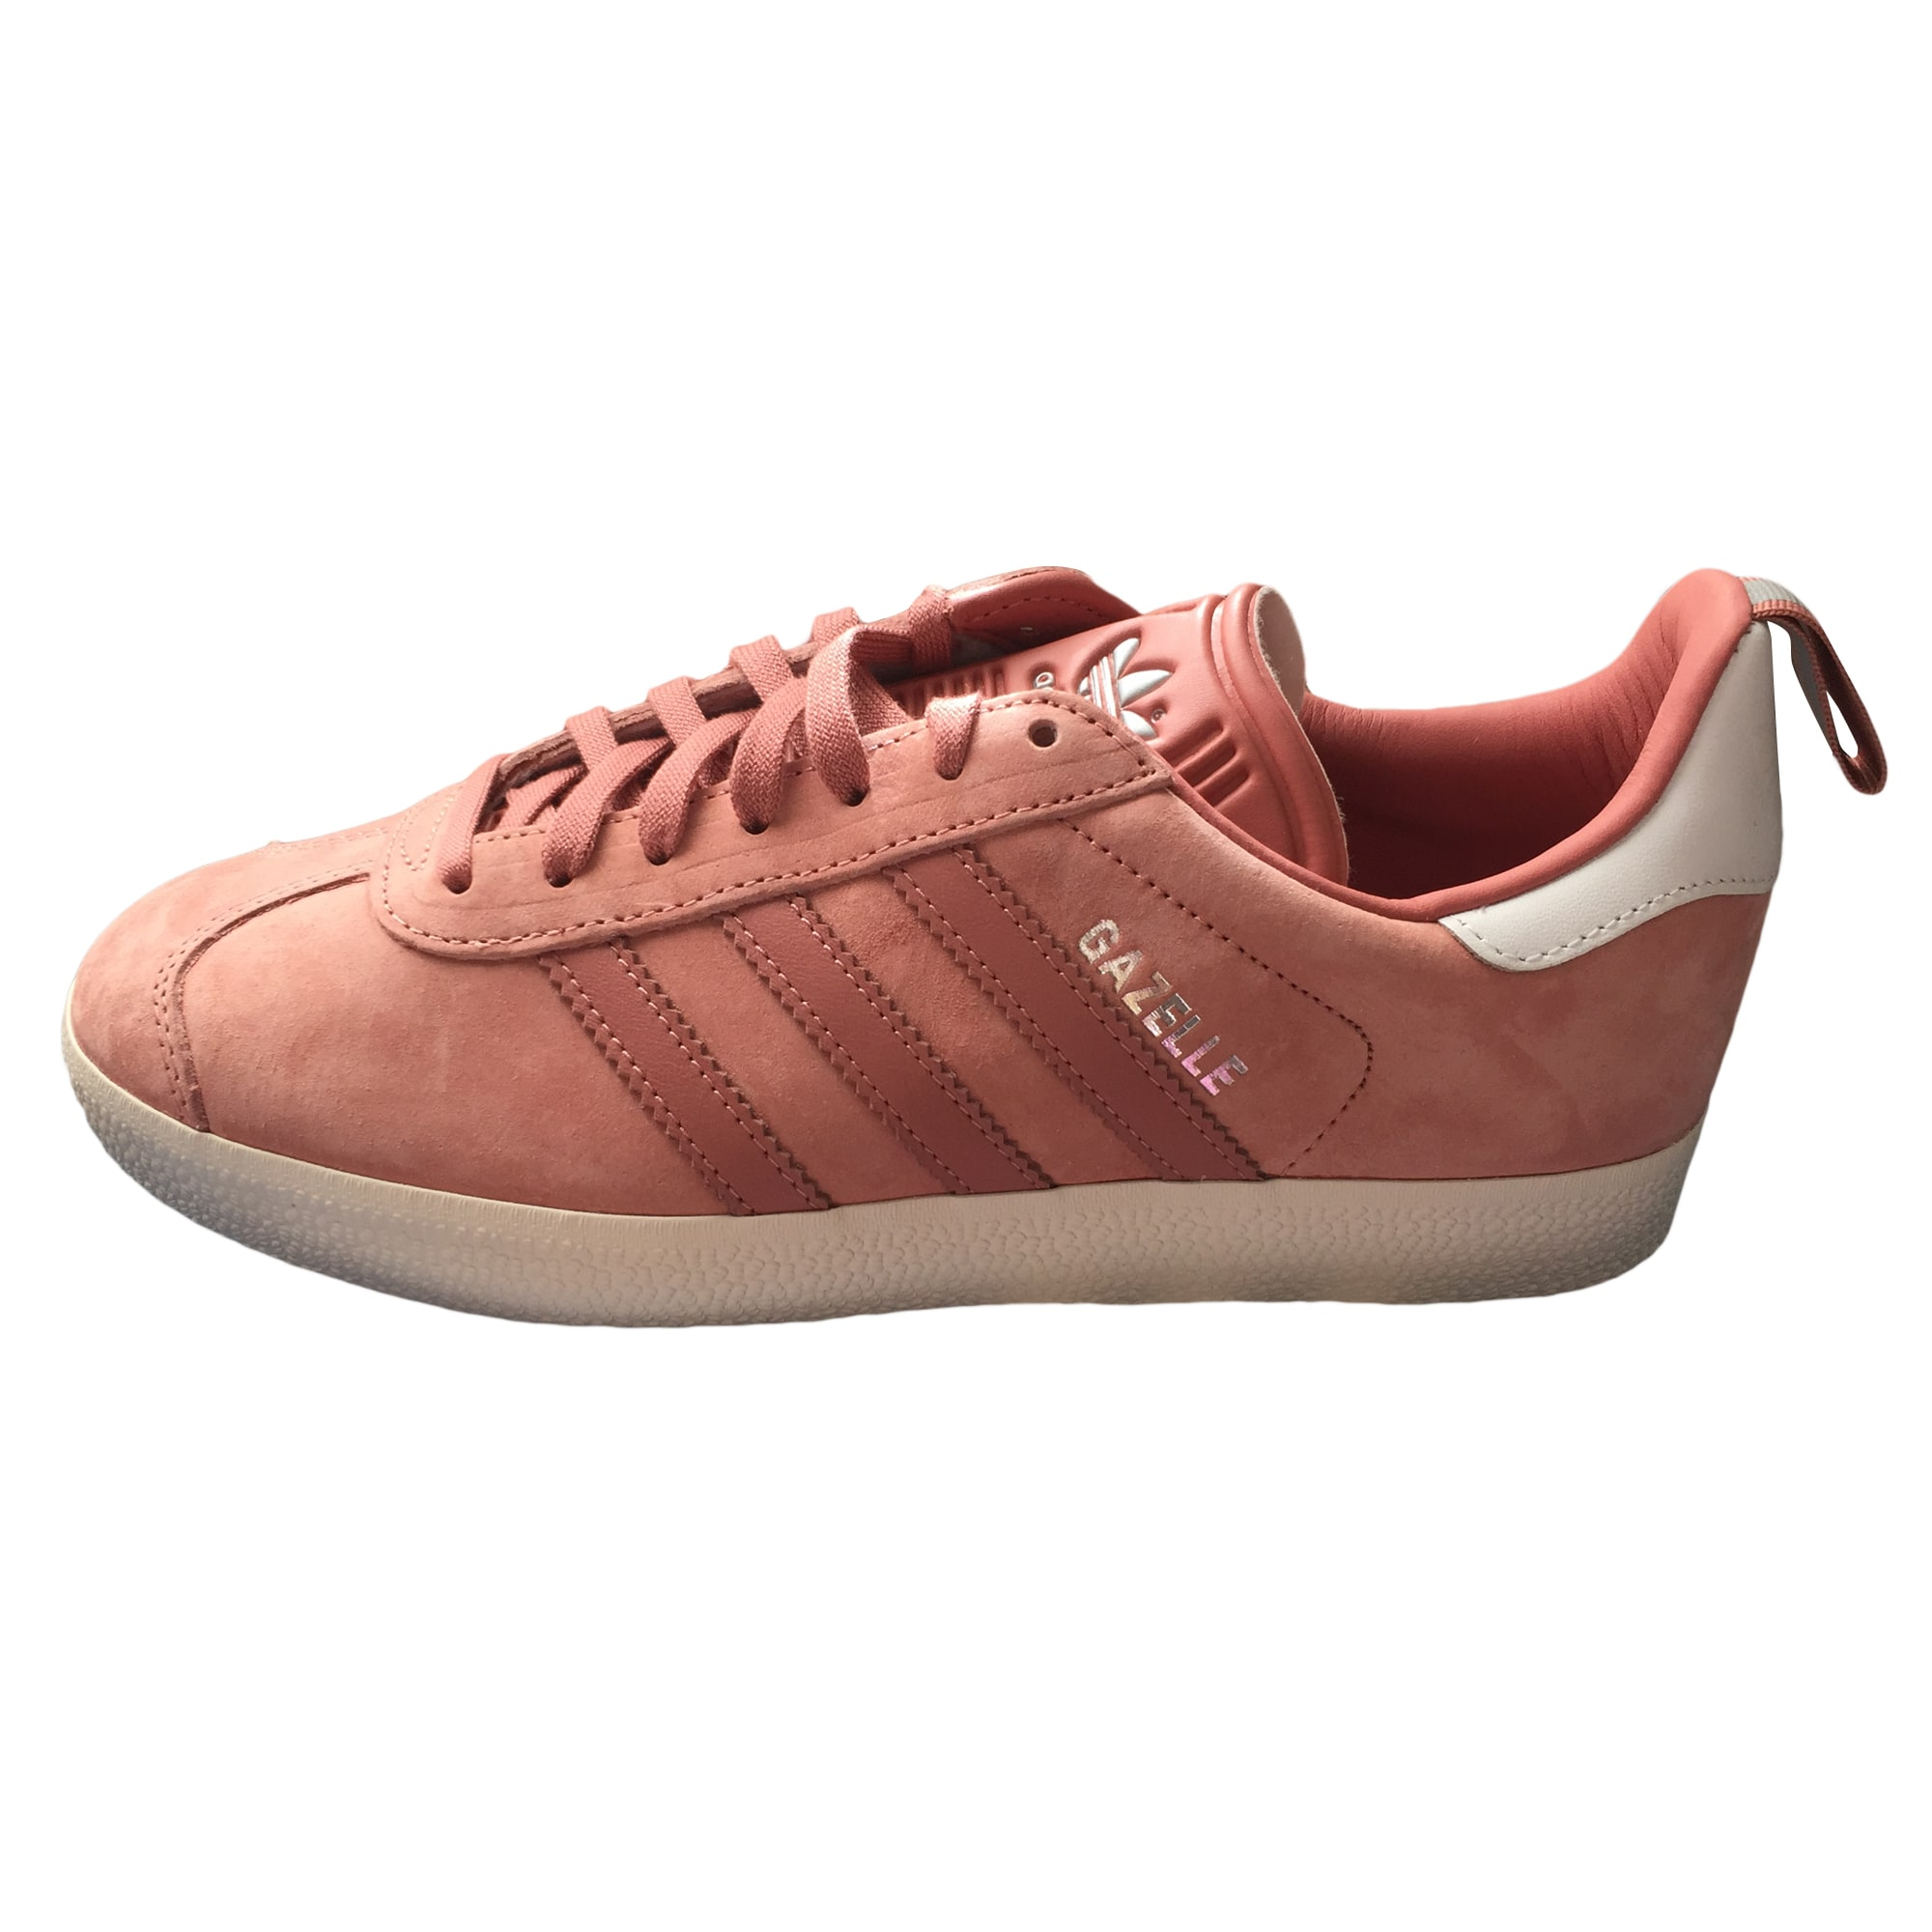 Sneakers ADIDAS Pink, fuchsia, light pink